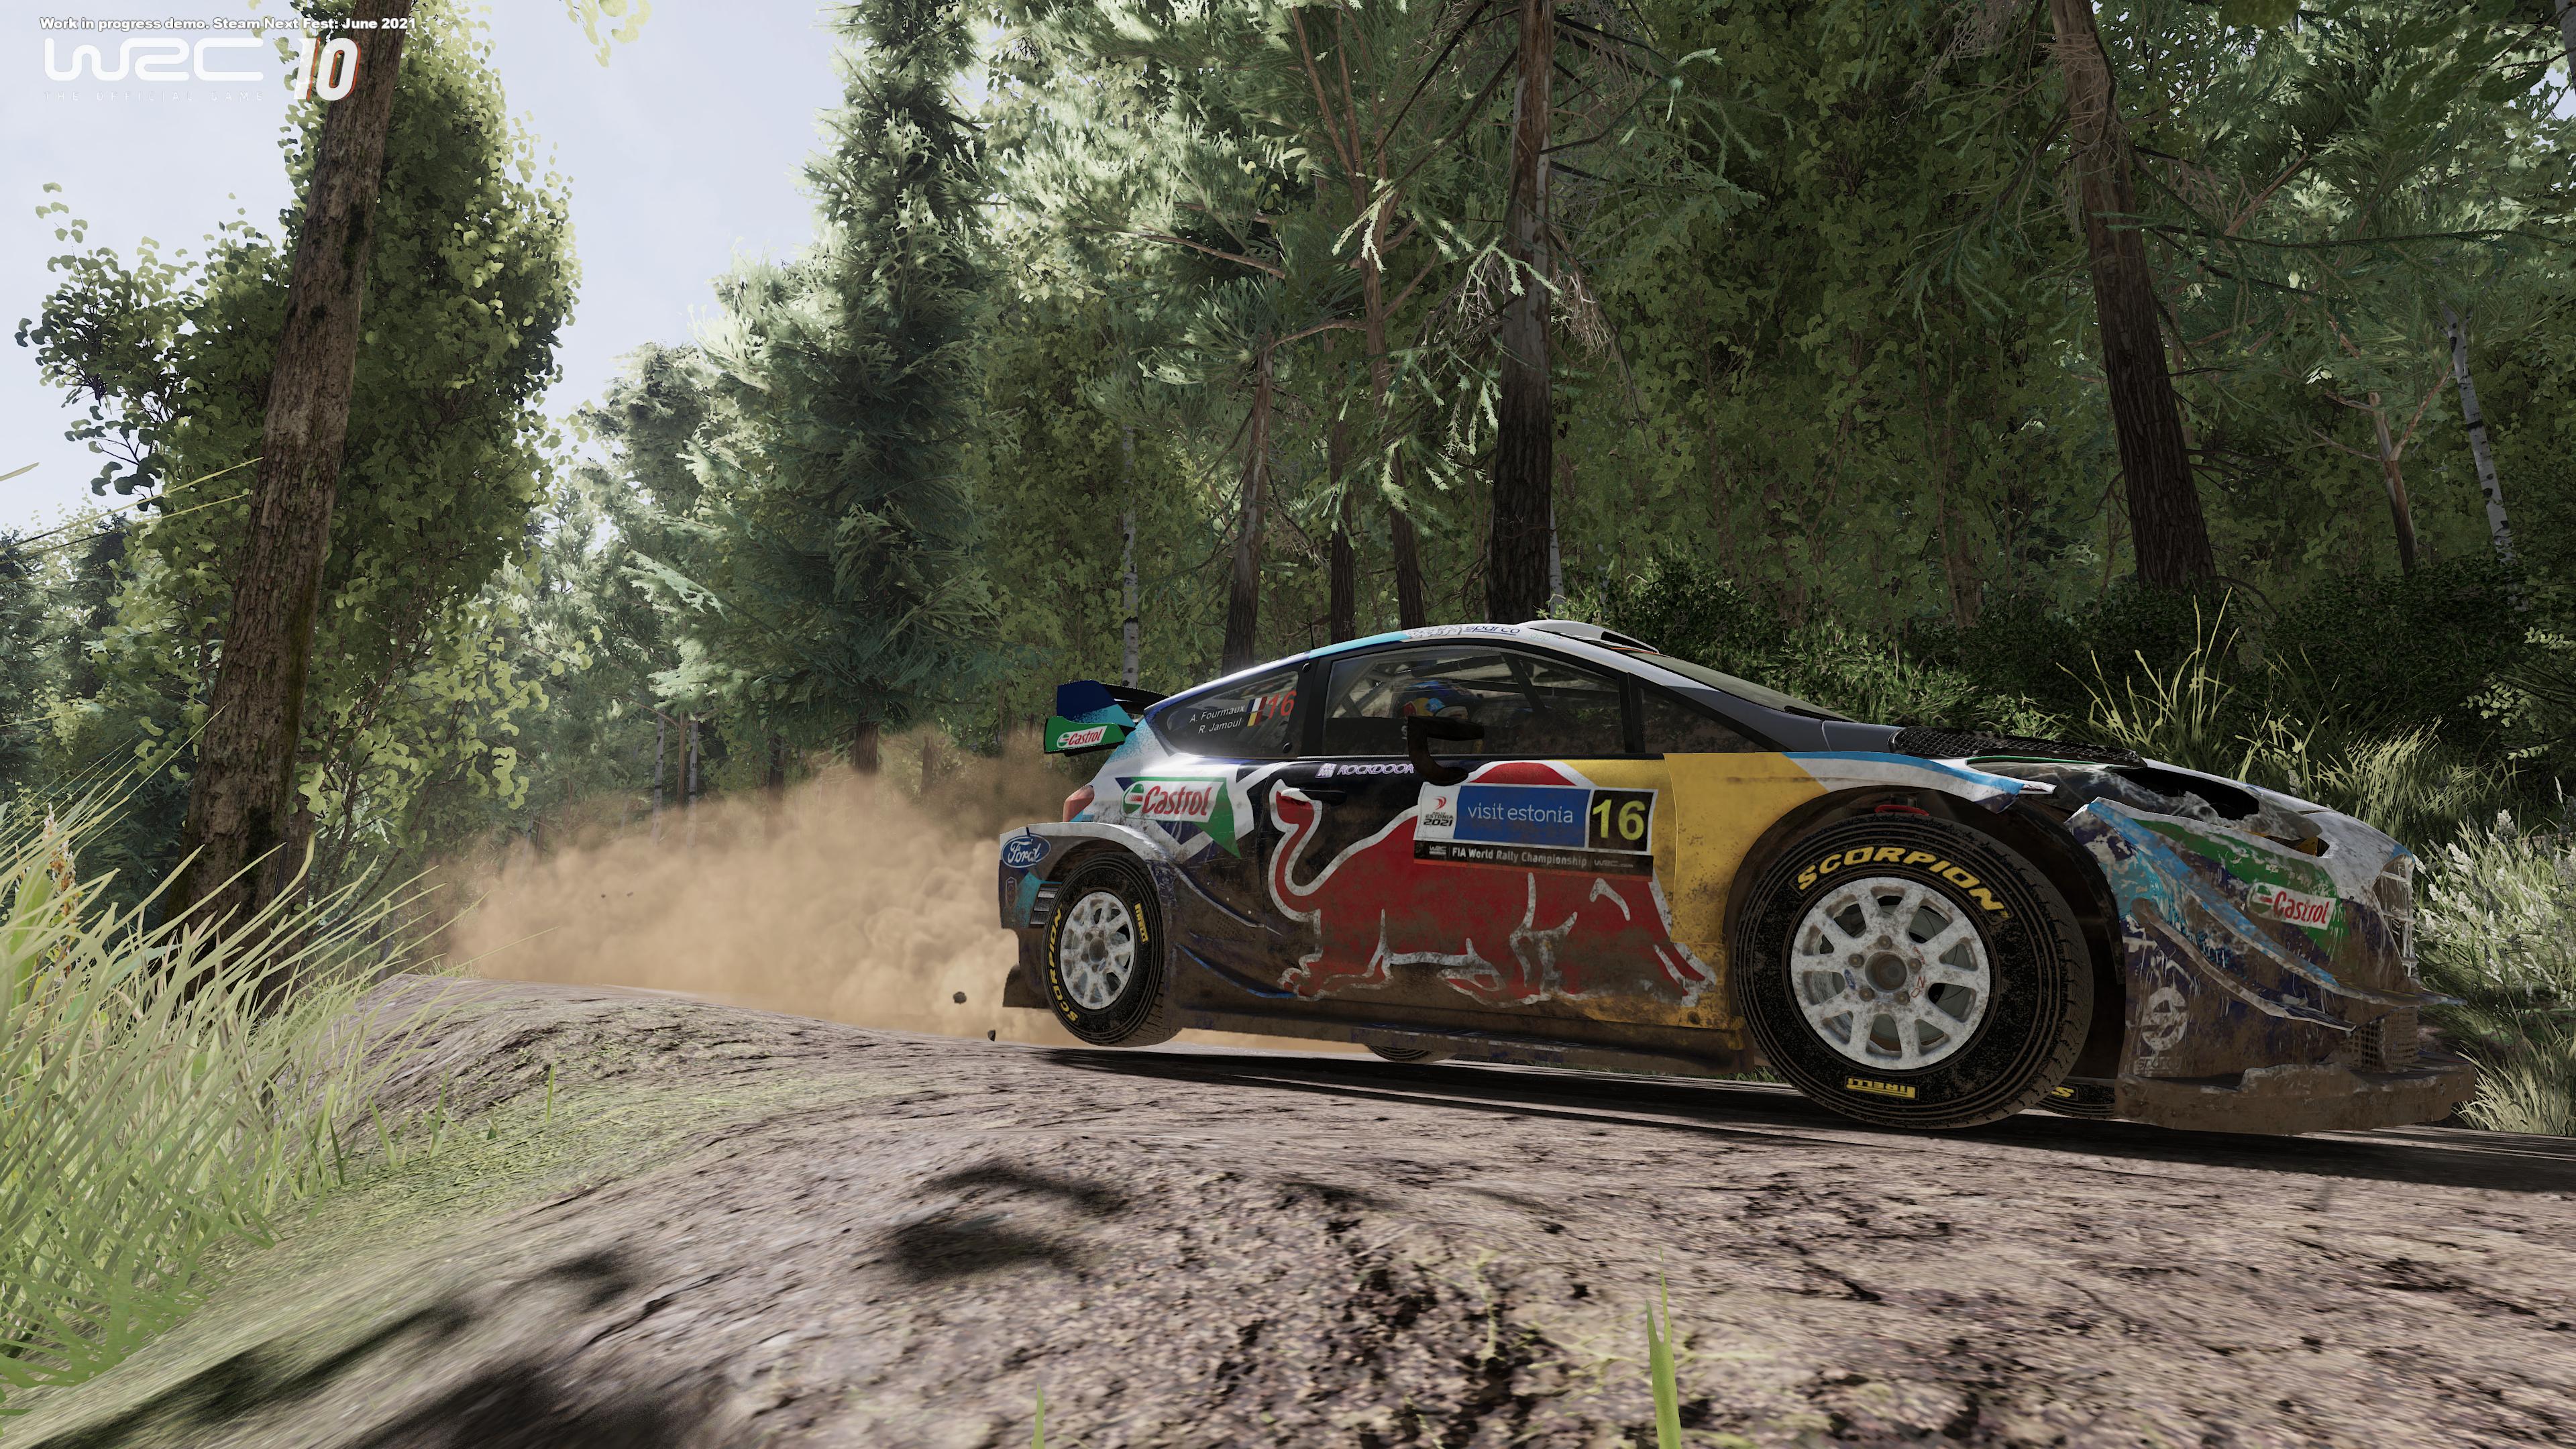 Wrc 10 Fia World Rally Championship Demo Screenshot 2021.06.12 - 13.43.13.24